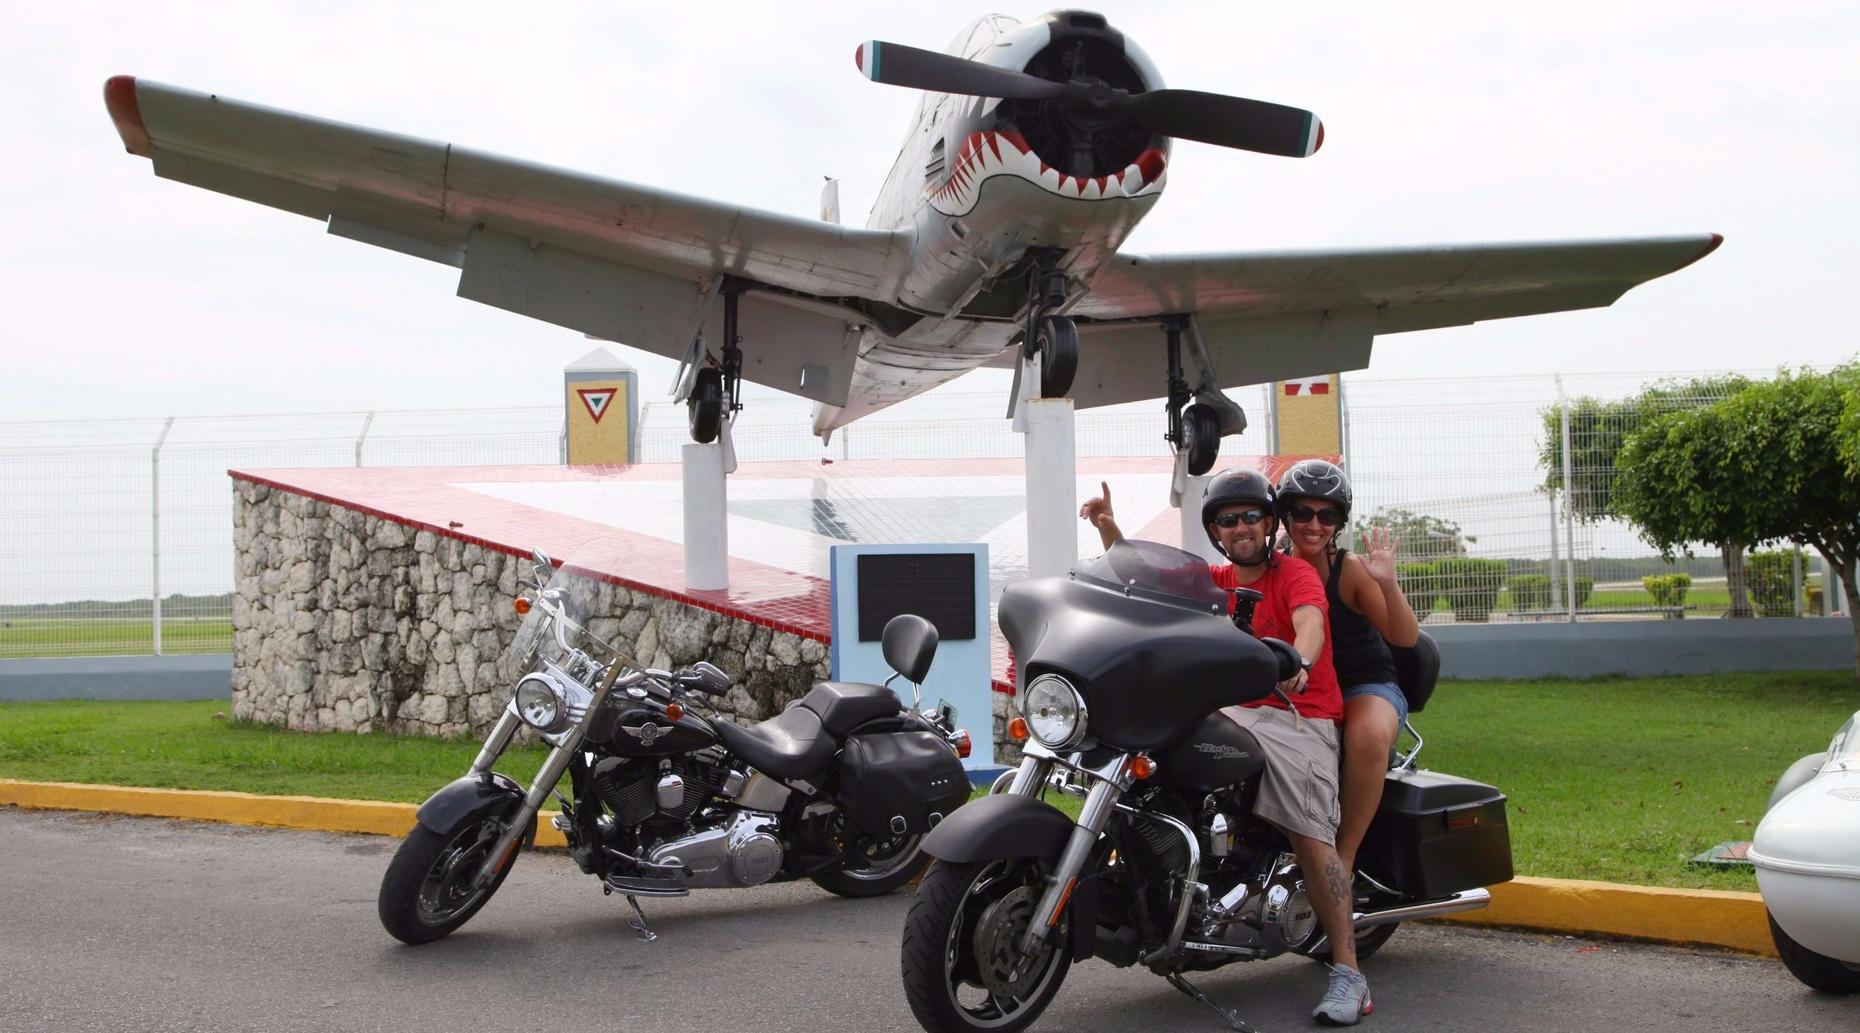 Harley Davidson Tour in Cozumel